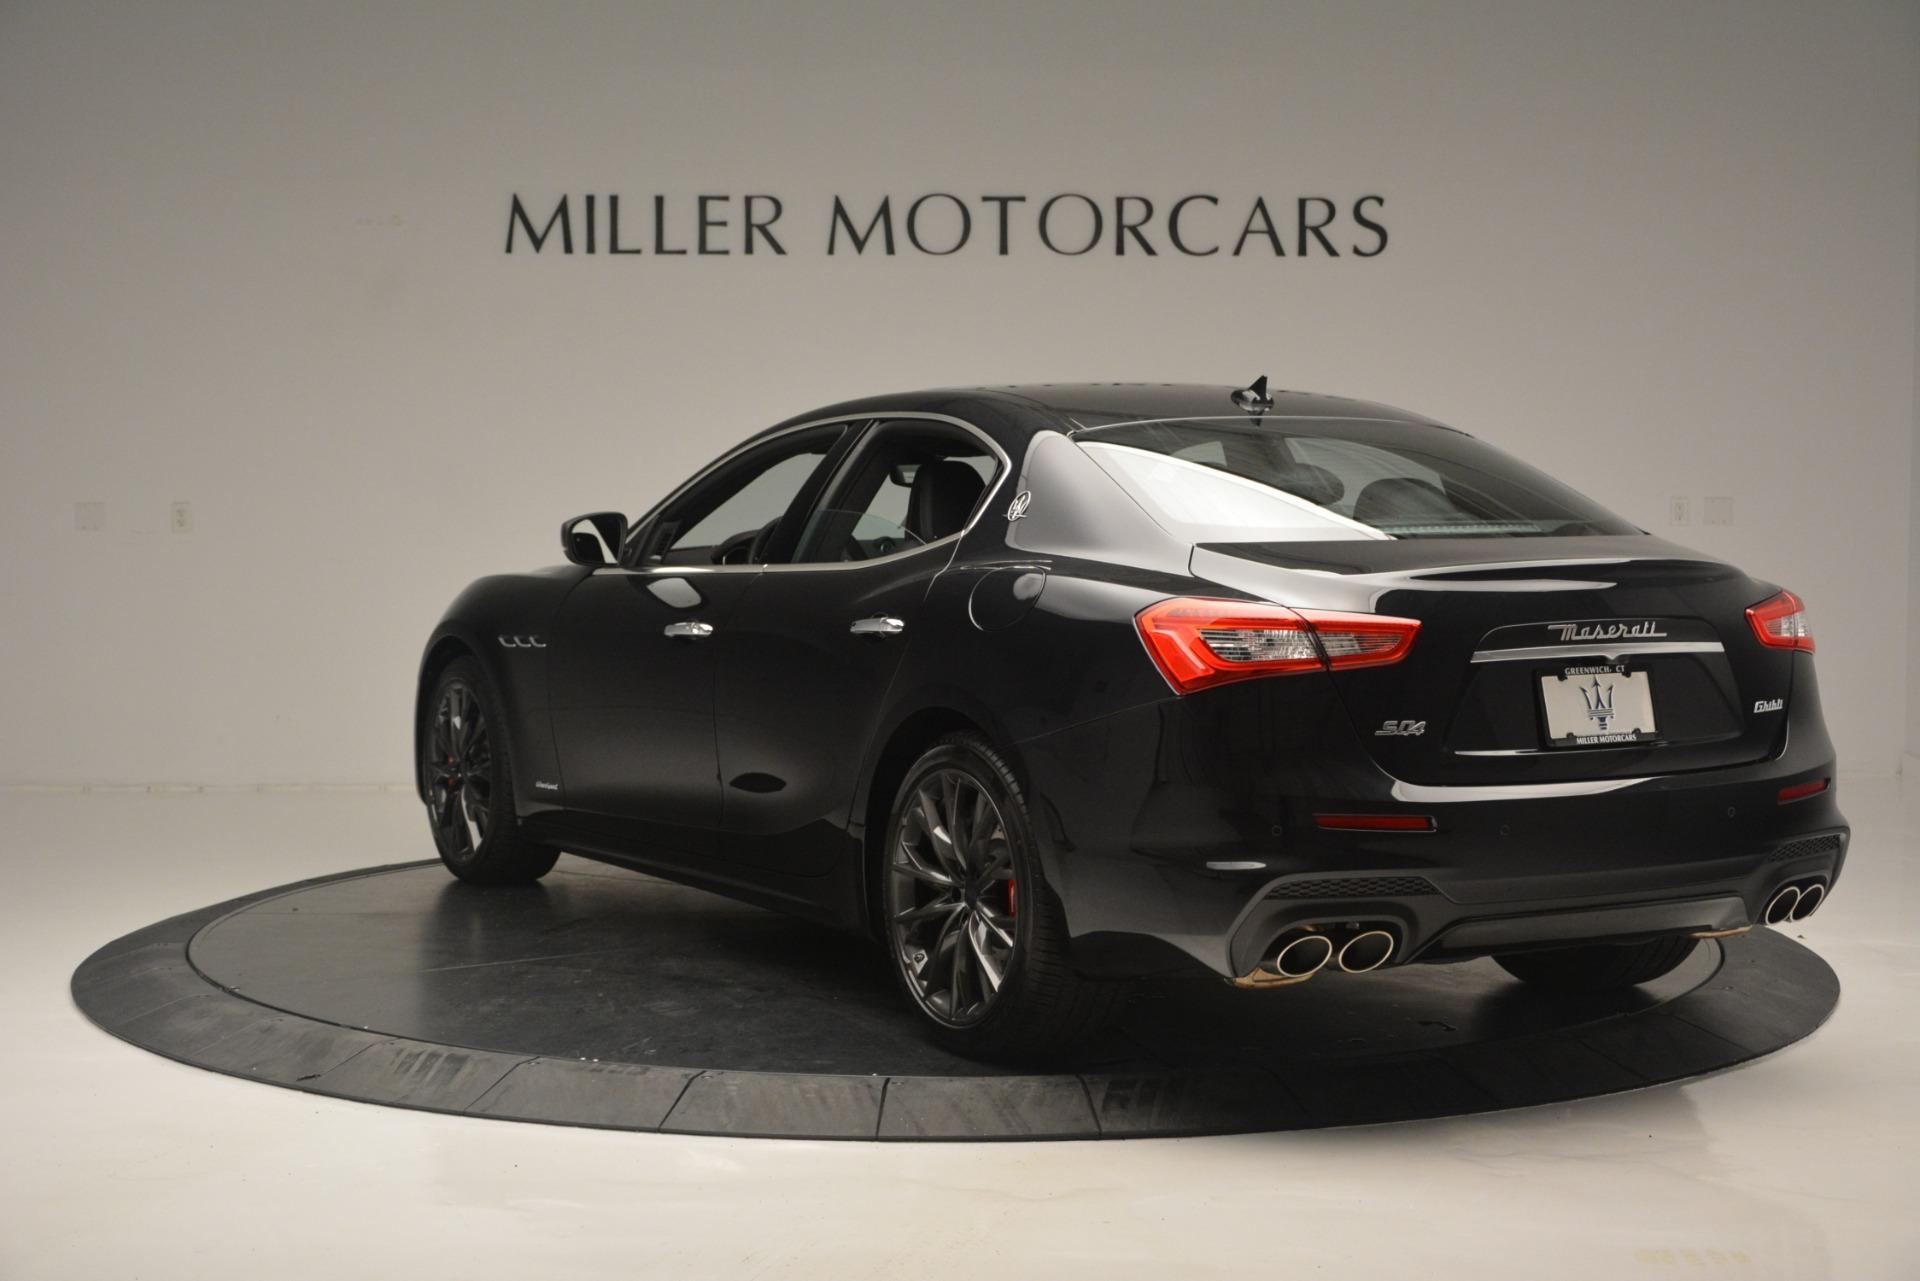 New 2019 Maserati Ghibli S Q4 GranSport For Sale In Greenwich, CT 2765_p5